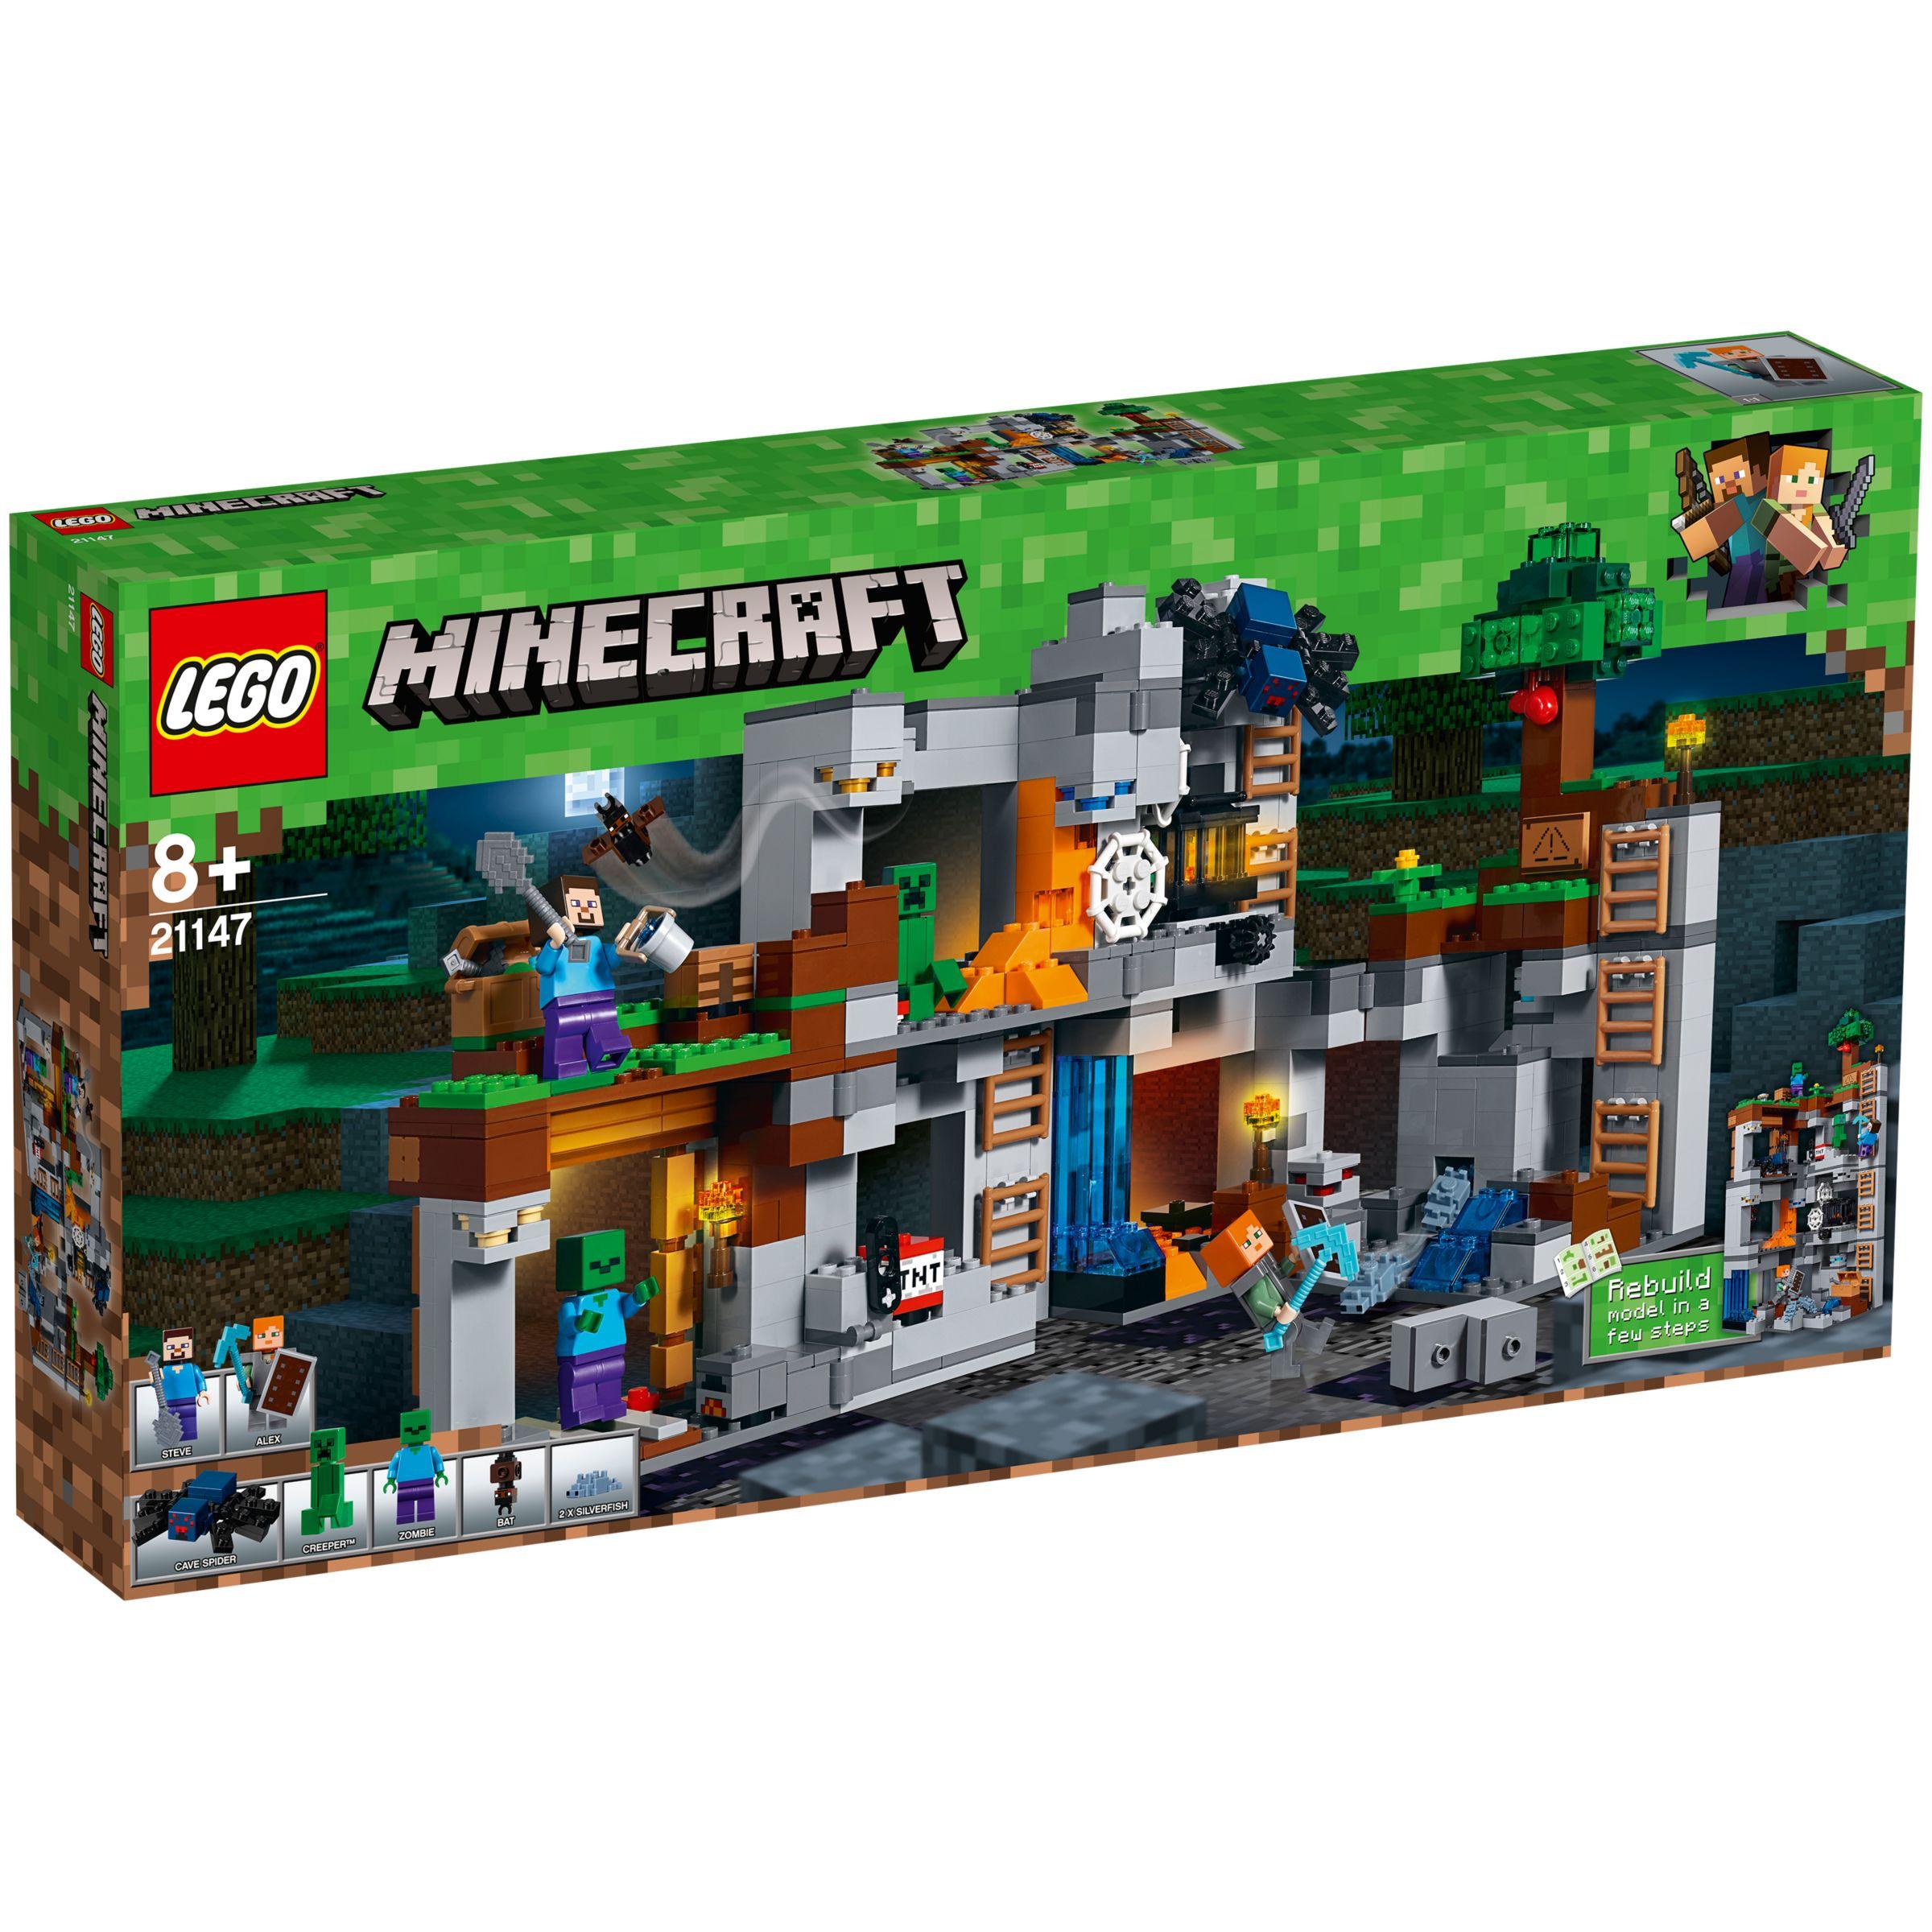 LEGO Minecraft 21147 Bedrock Adventures at John Lewis & Partners